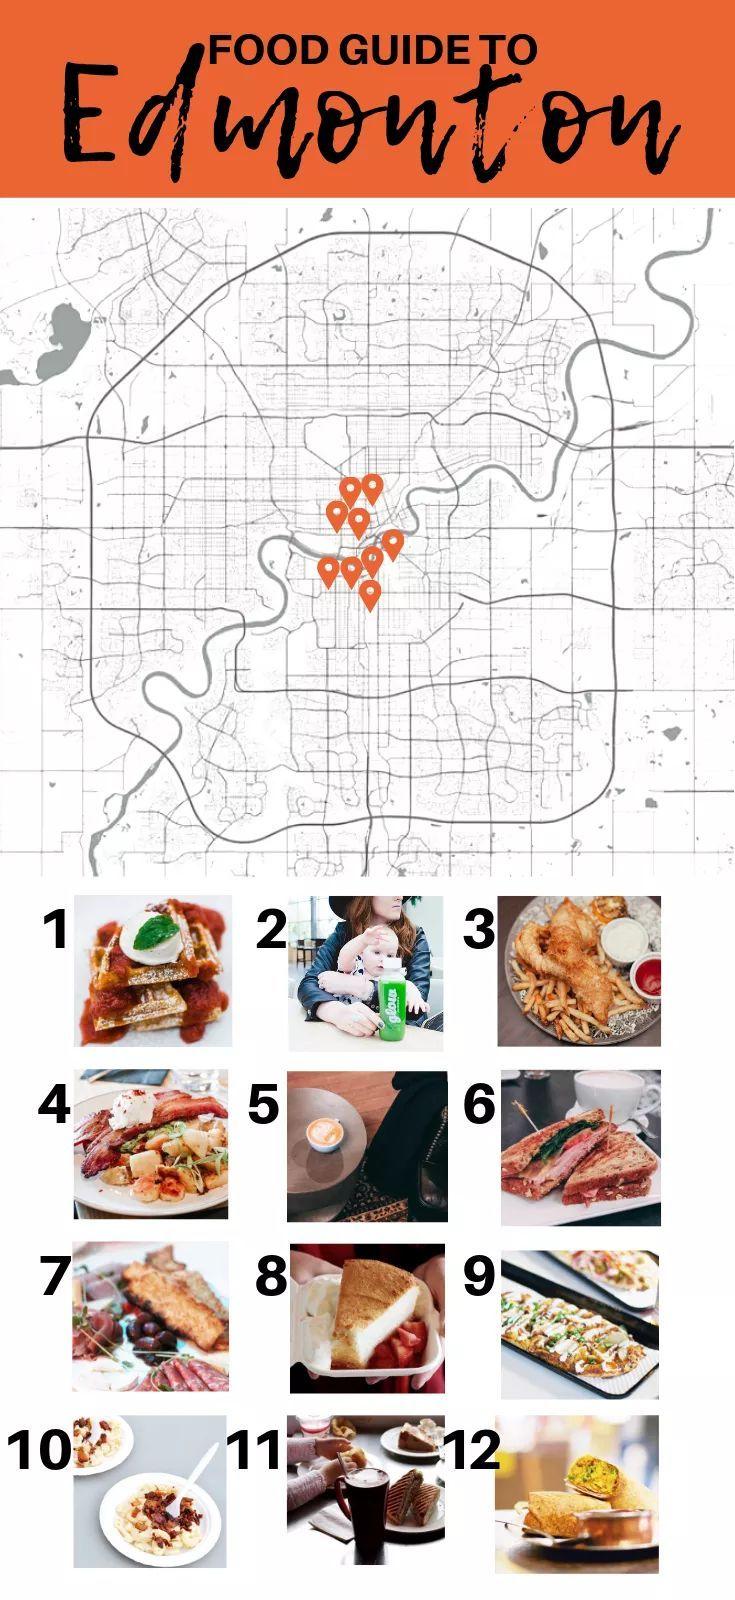 Yeg Food Guide 12 Must Try Edmonton Restaurants Downtown In 2020 Edmonton Restaurants Best Restaurants In Edmonton Food Guide